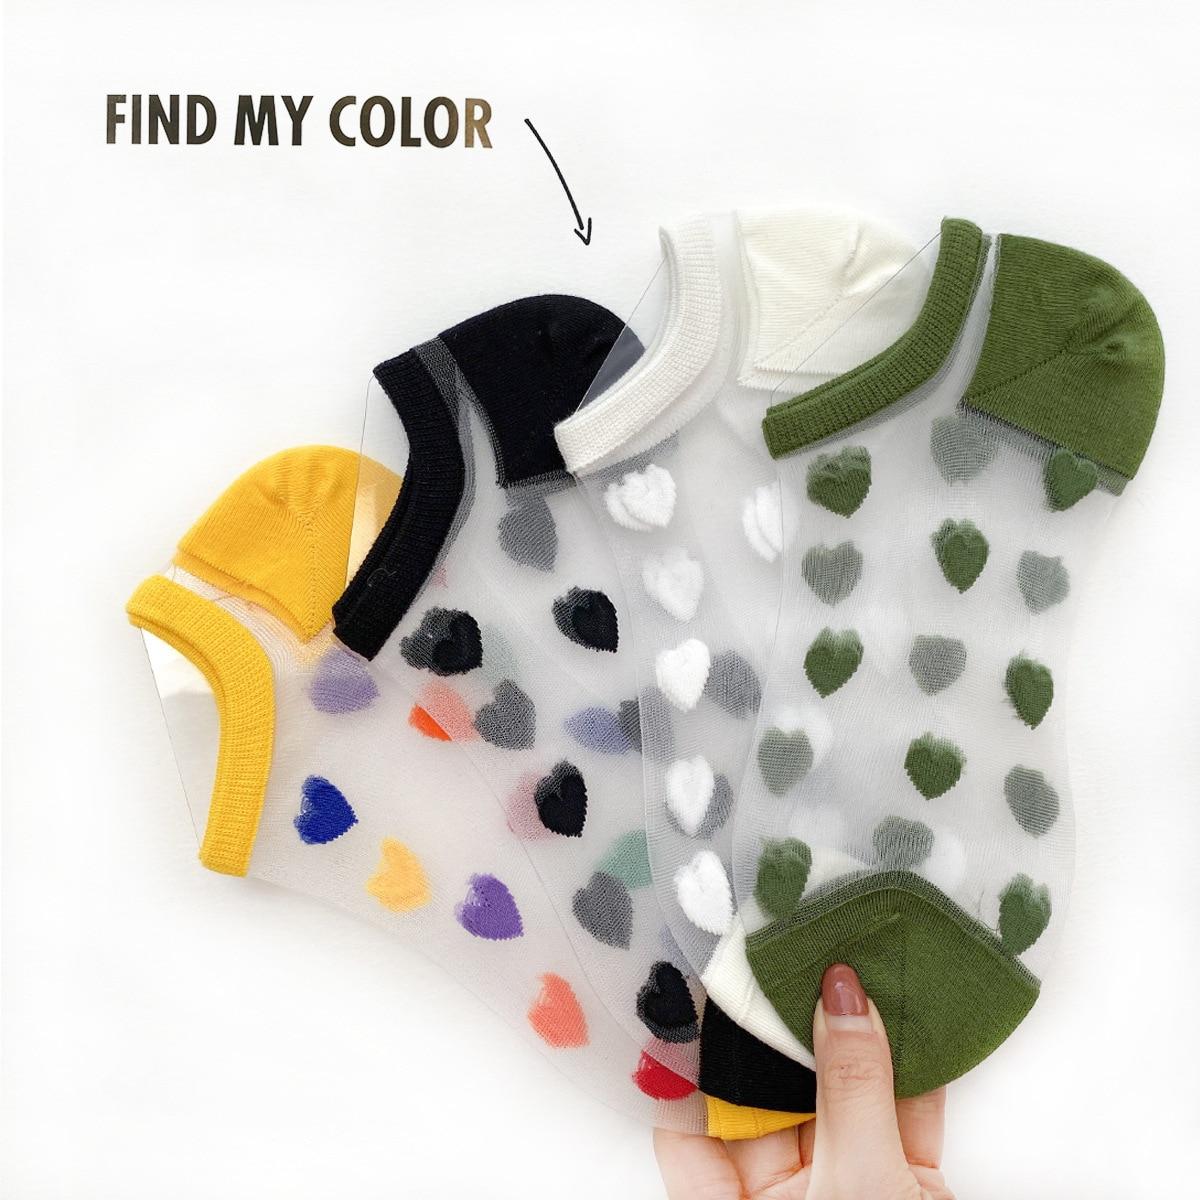 Fashion Women Sock Slippers 2020 New Fashion Color Summer Style Thin Women Cute Transparent Ankle Socks Women Invisable Socks